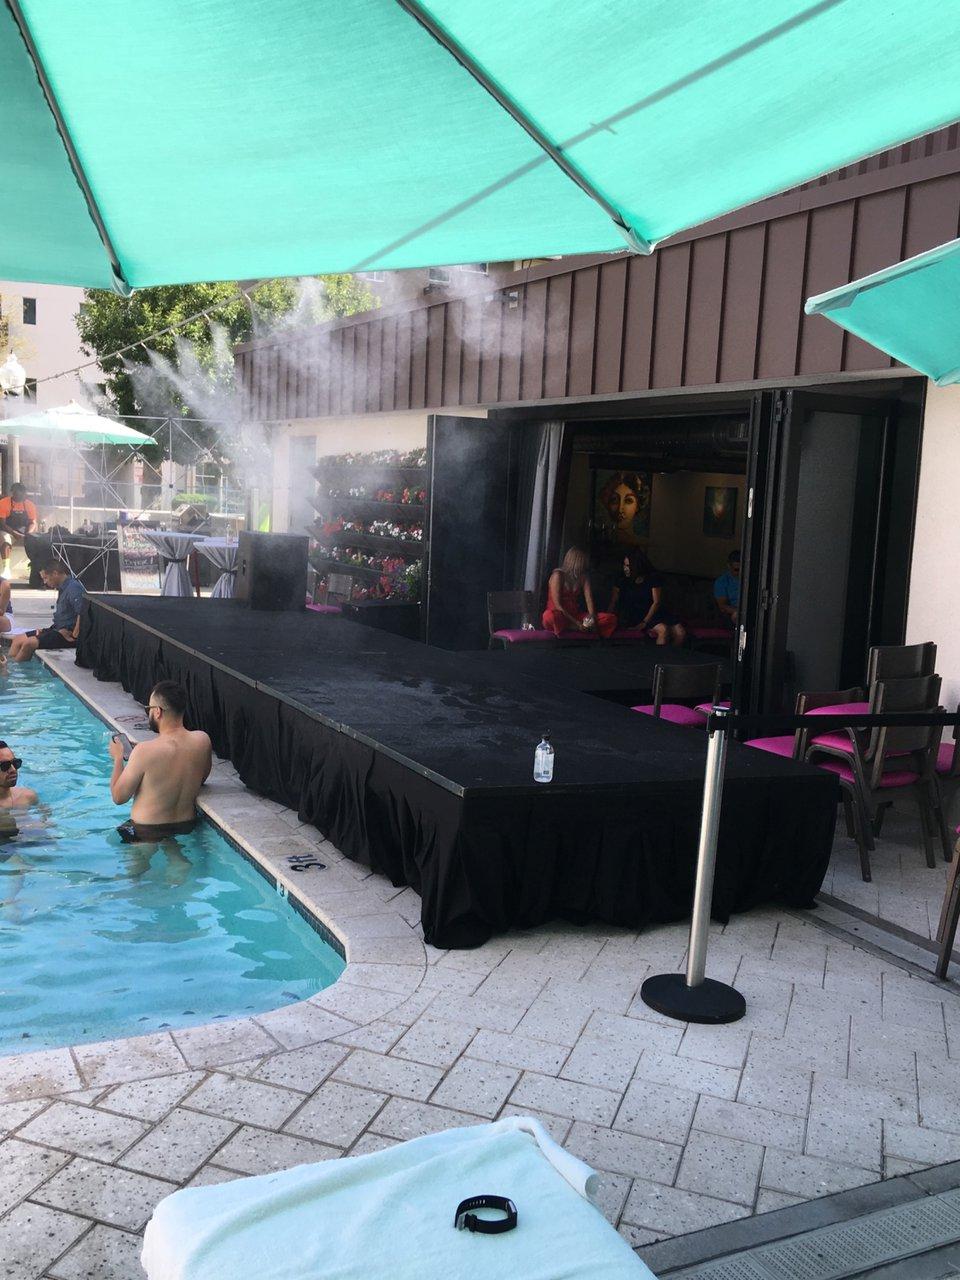 Fashion show @ Found RE Phoenix Hotel photo 0A176E67-C48F-4C45-A3DE-F0AEC45D8815.jpg